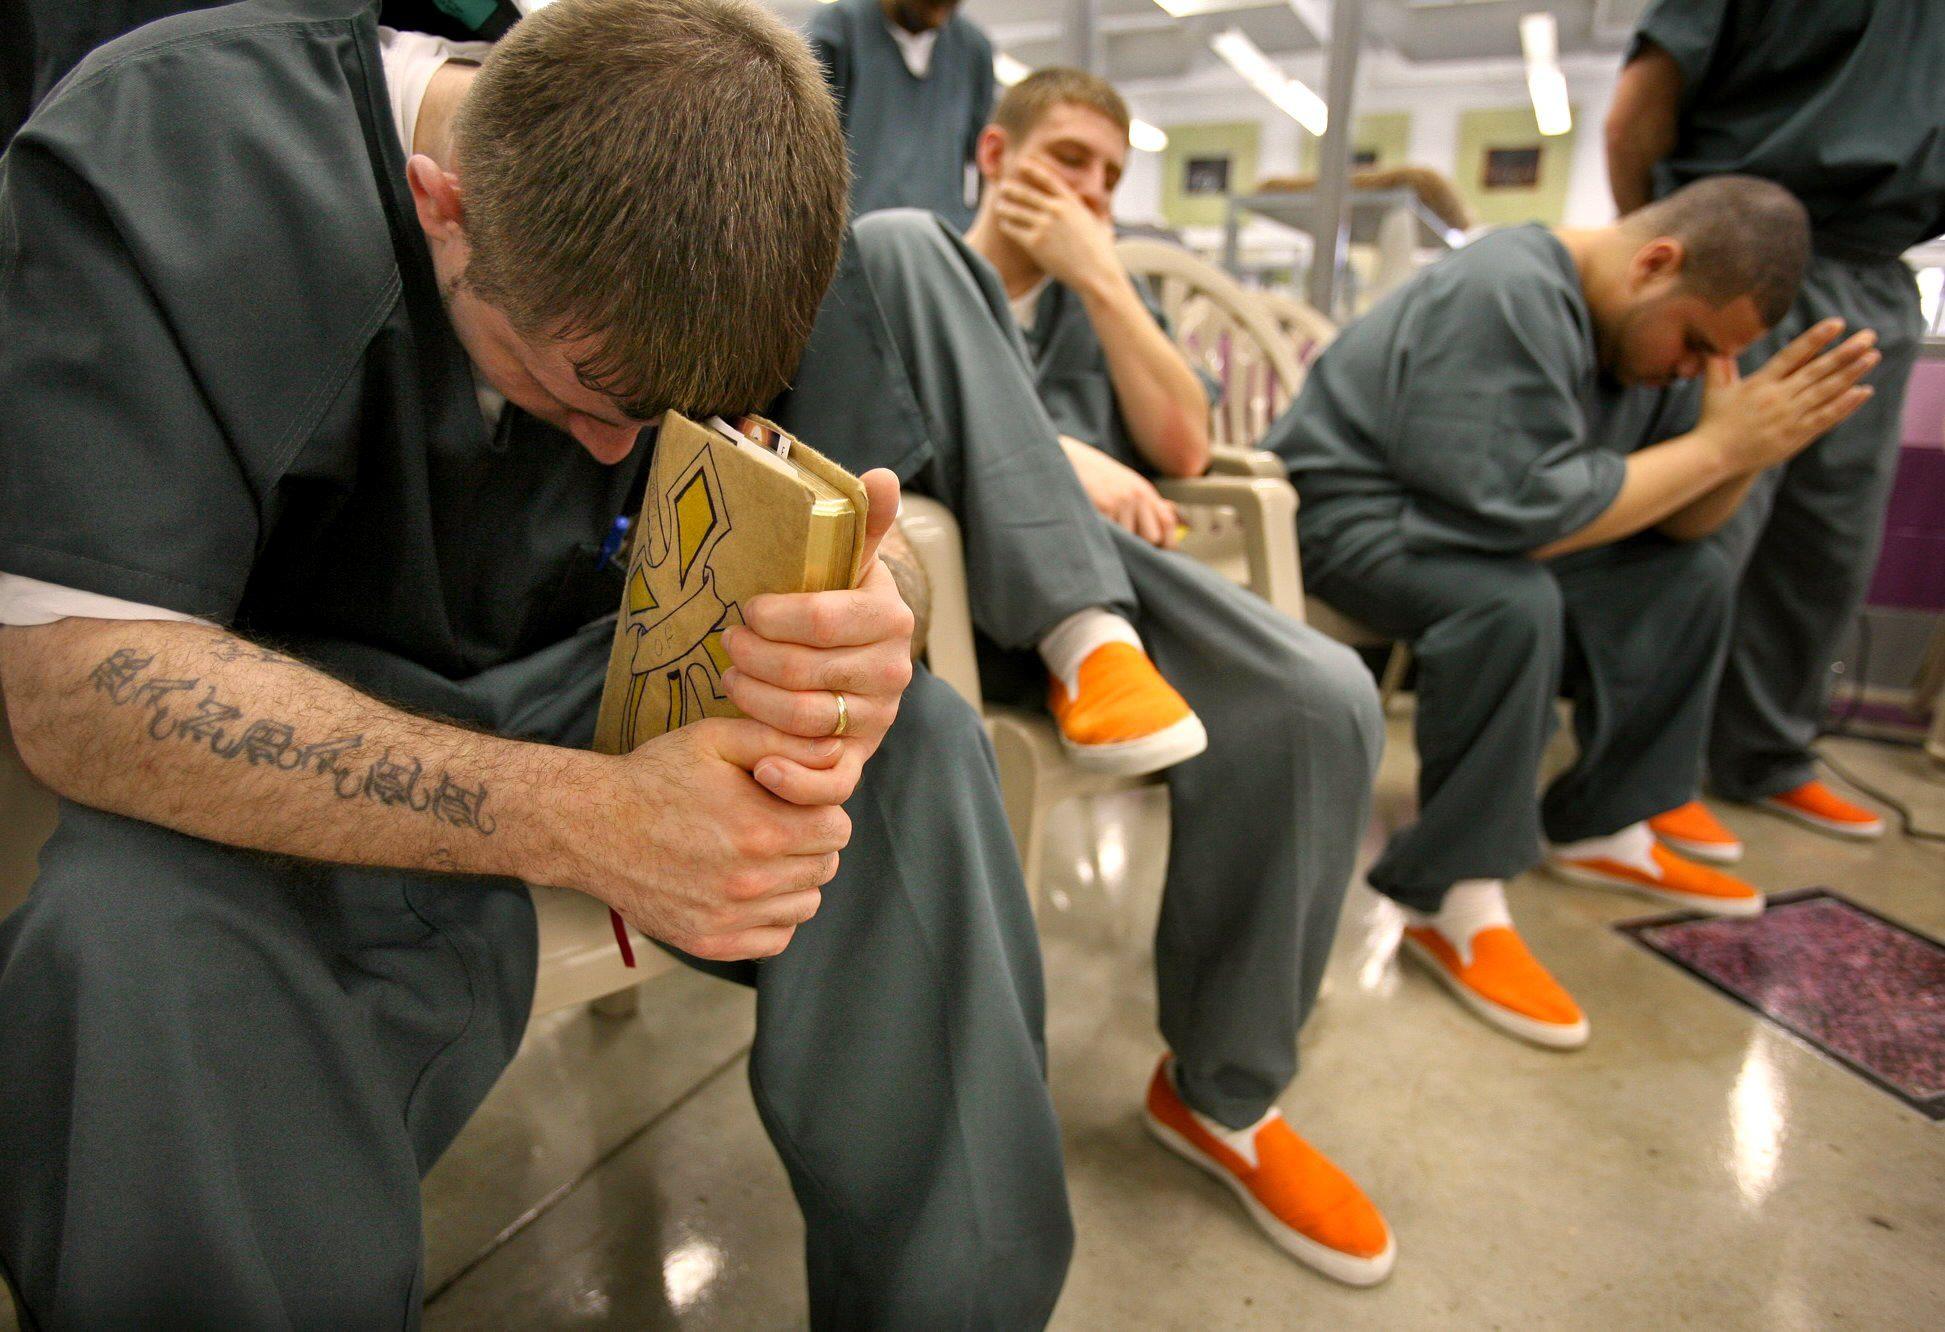 Inmate Sues Kansas Prison For Imposing Christian Propaganda